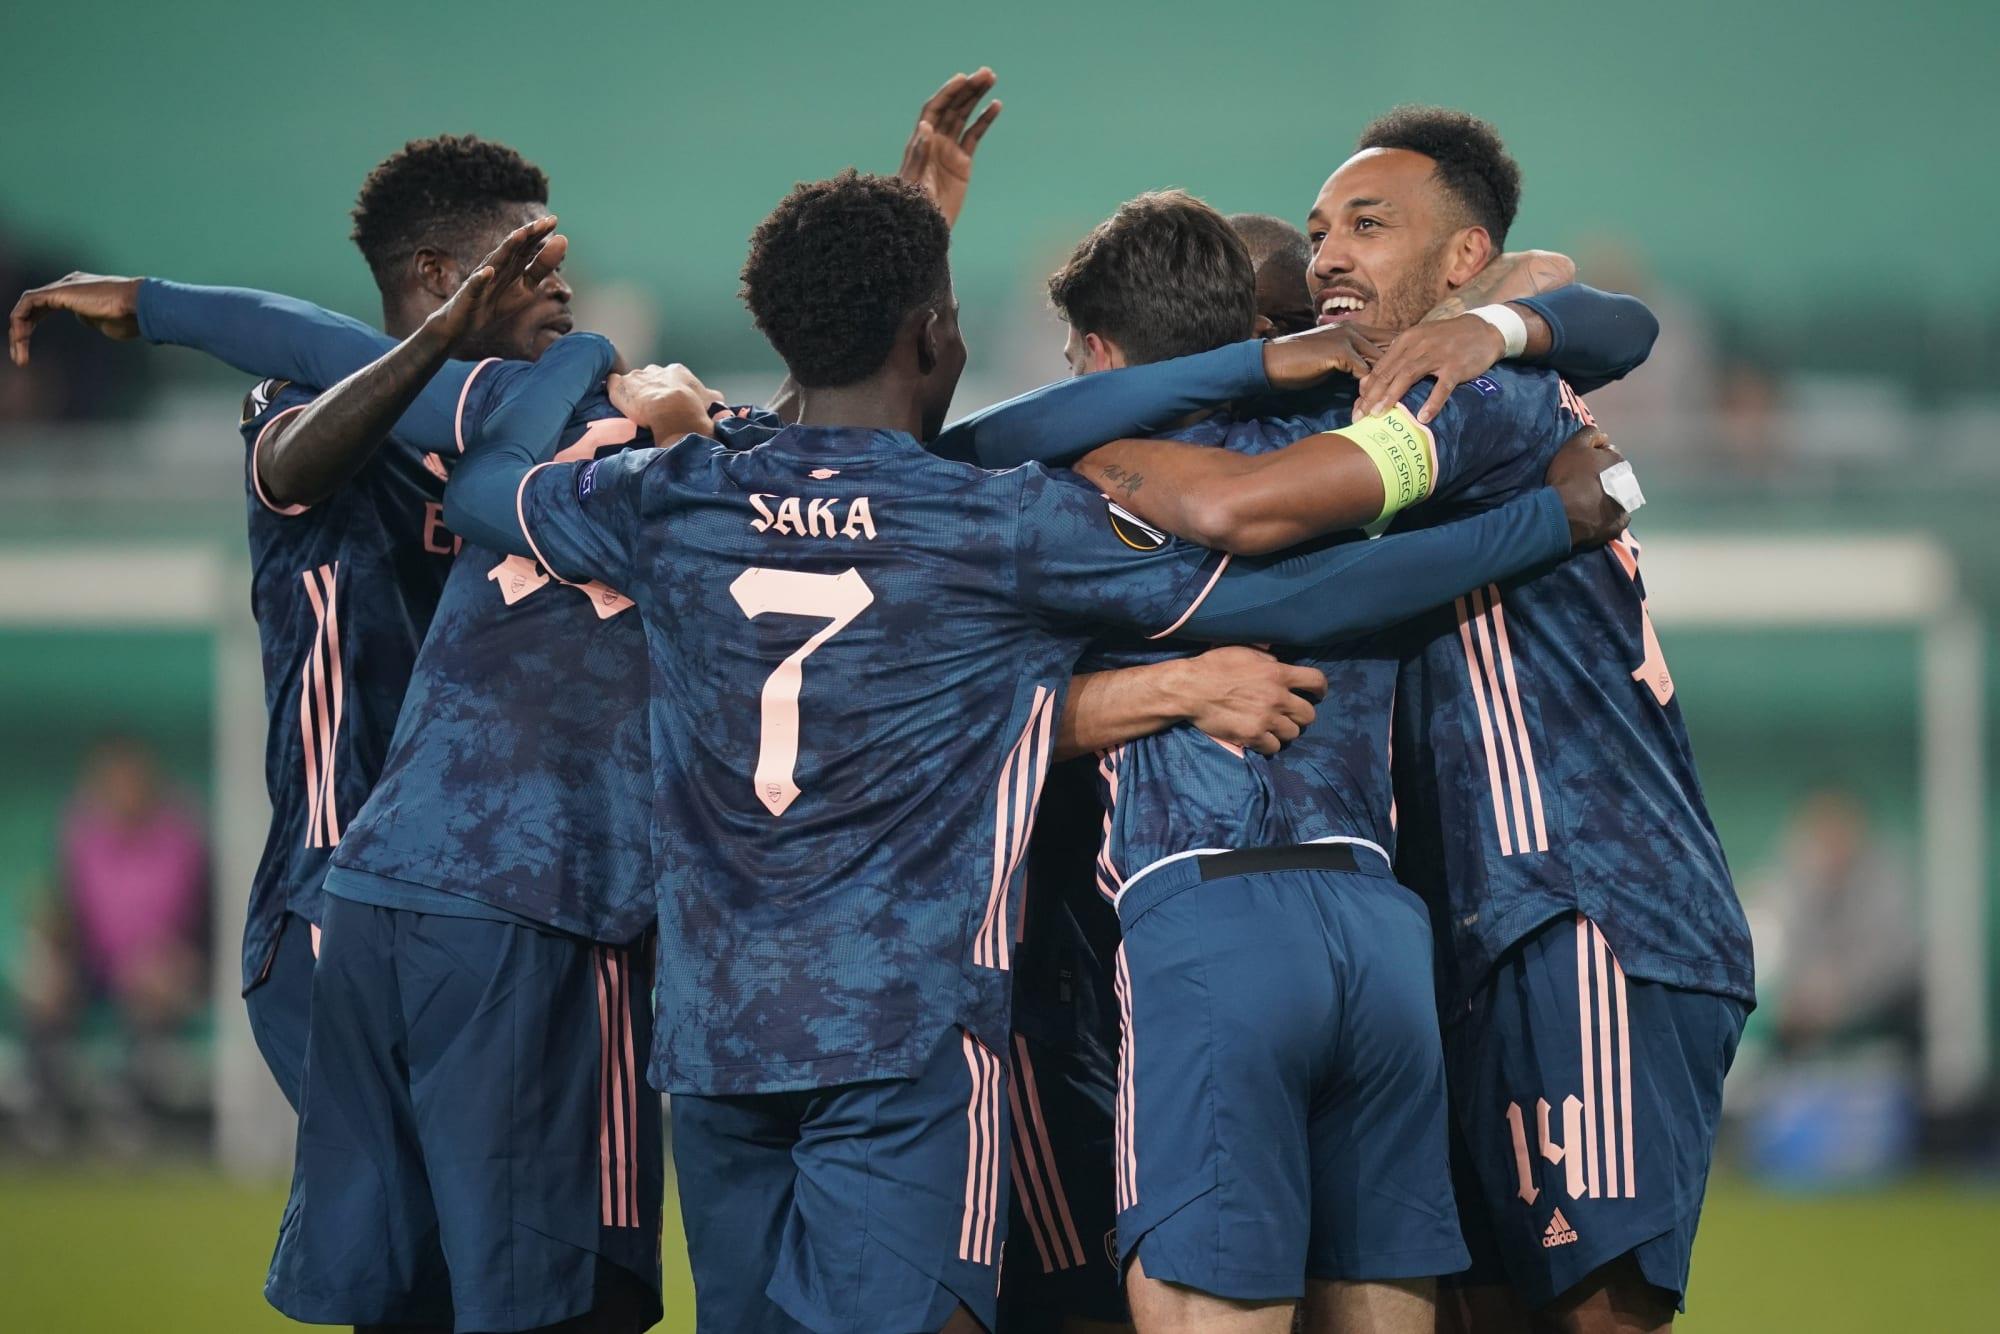 Arsenal vs Rapid Vienna: Score Prediction for Fans' Return